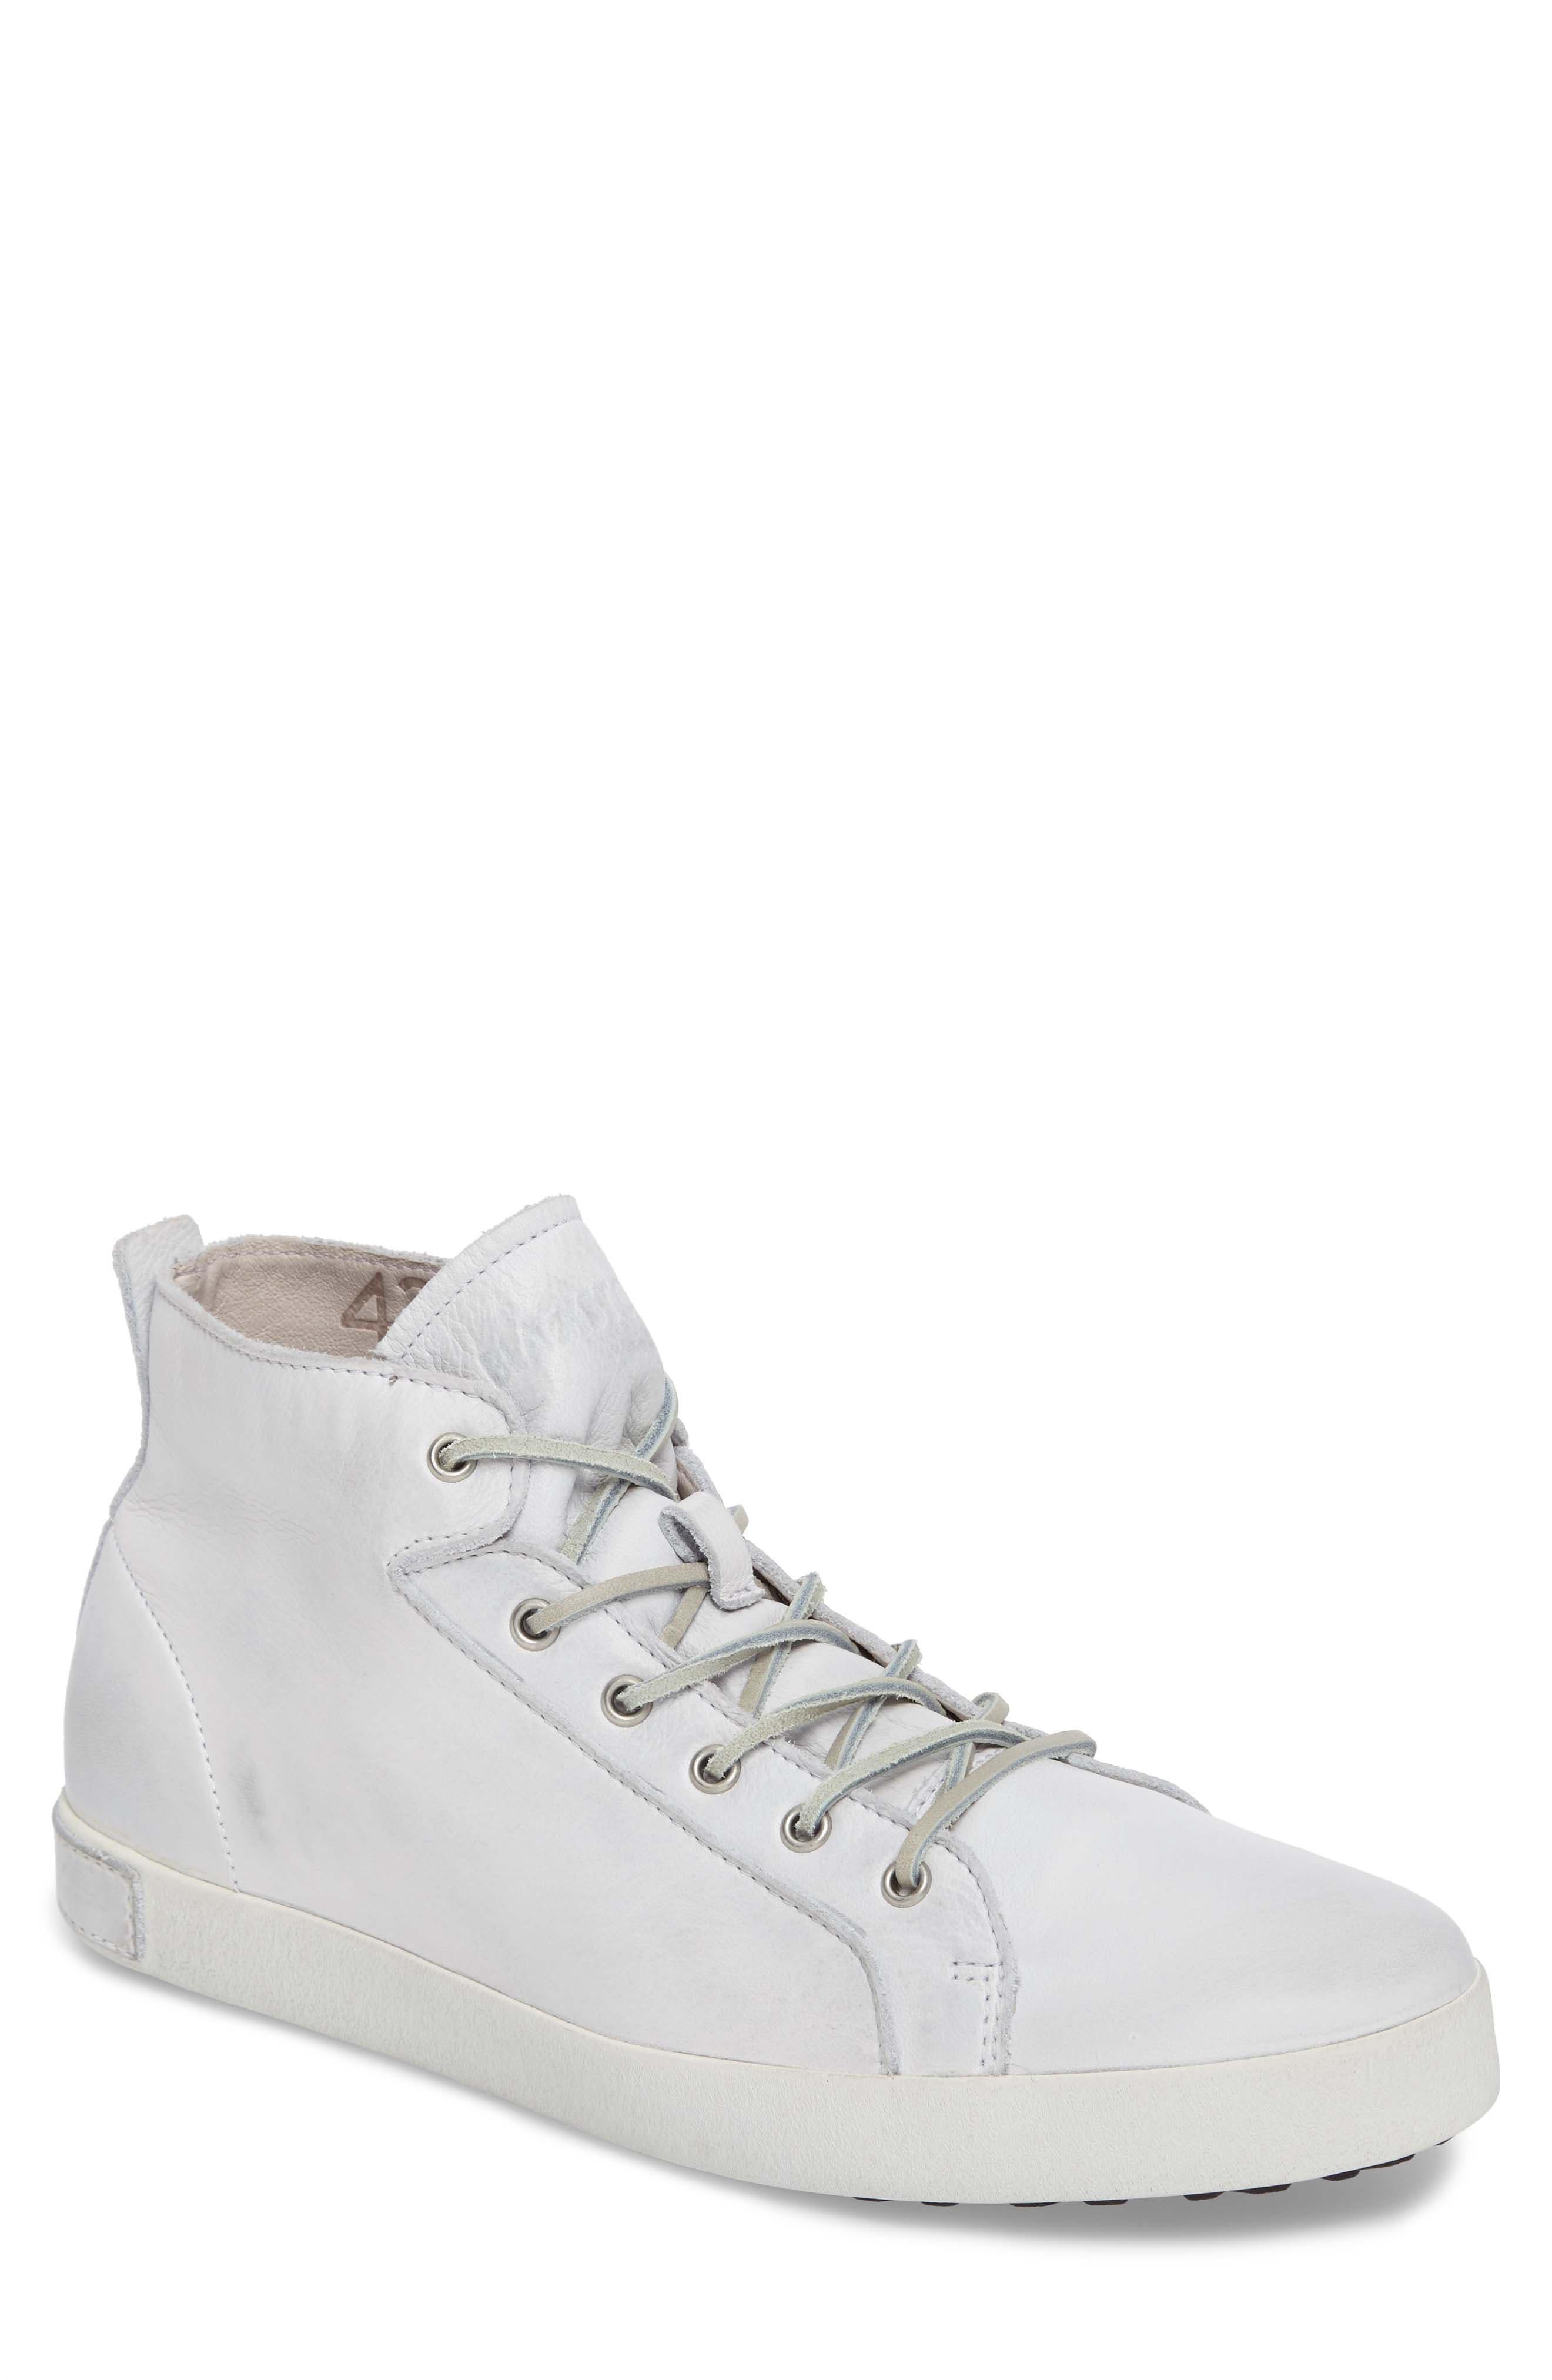 'JM03' Sneaker,                             Main thumbnail 1, color,                             100